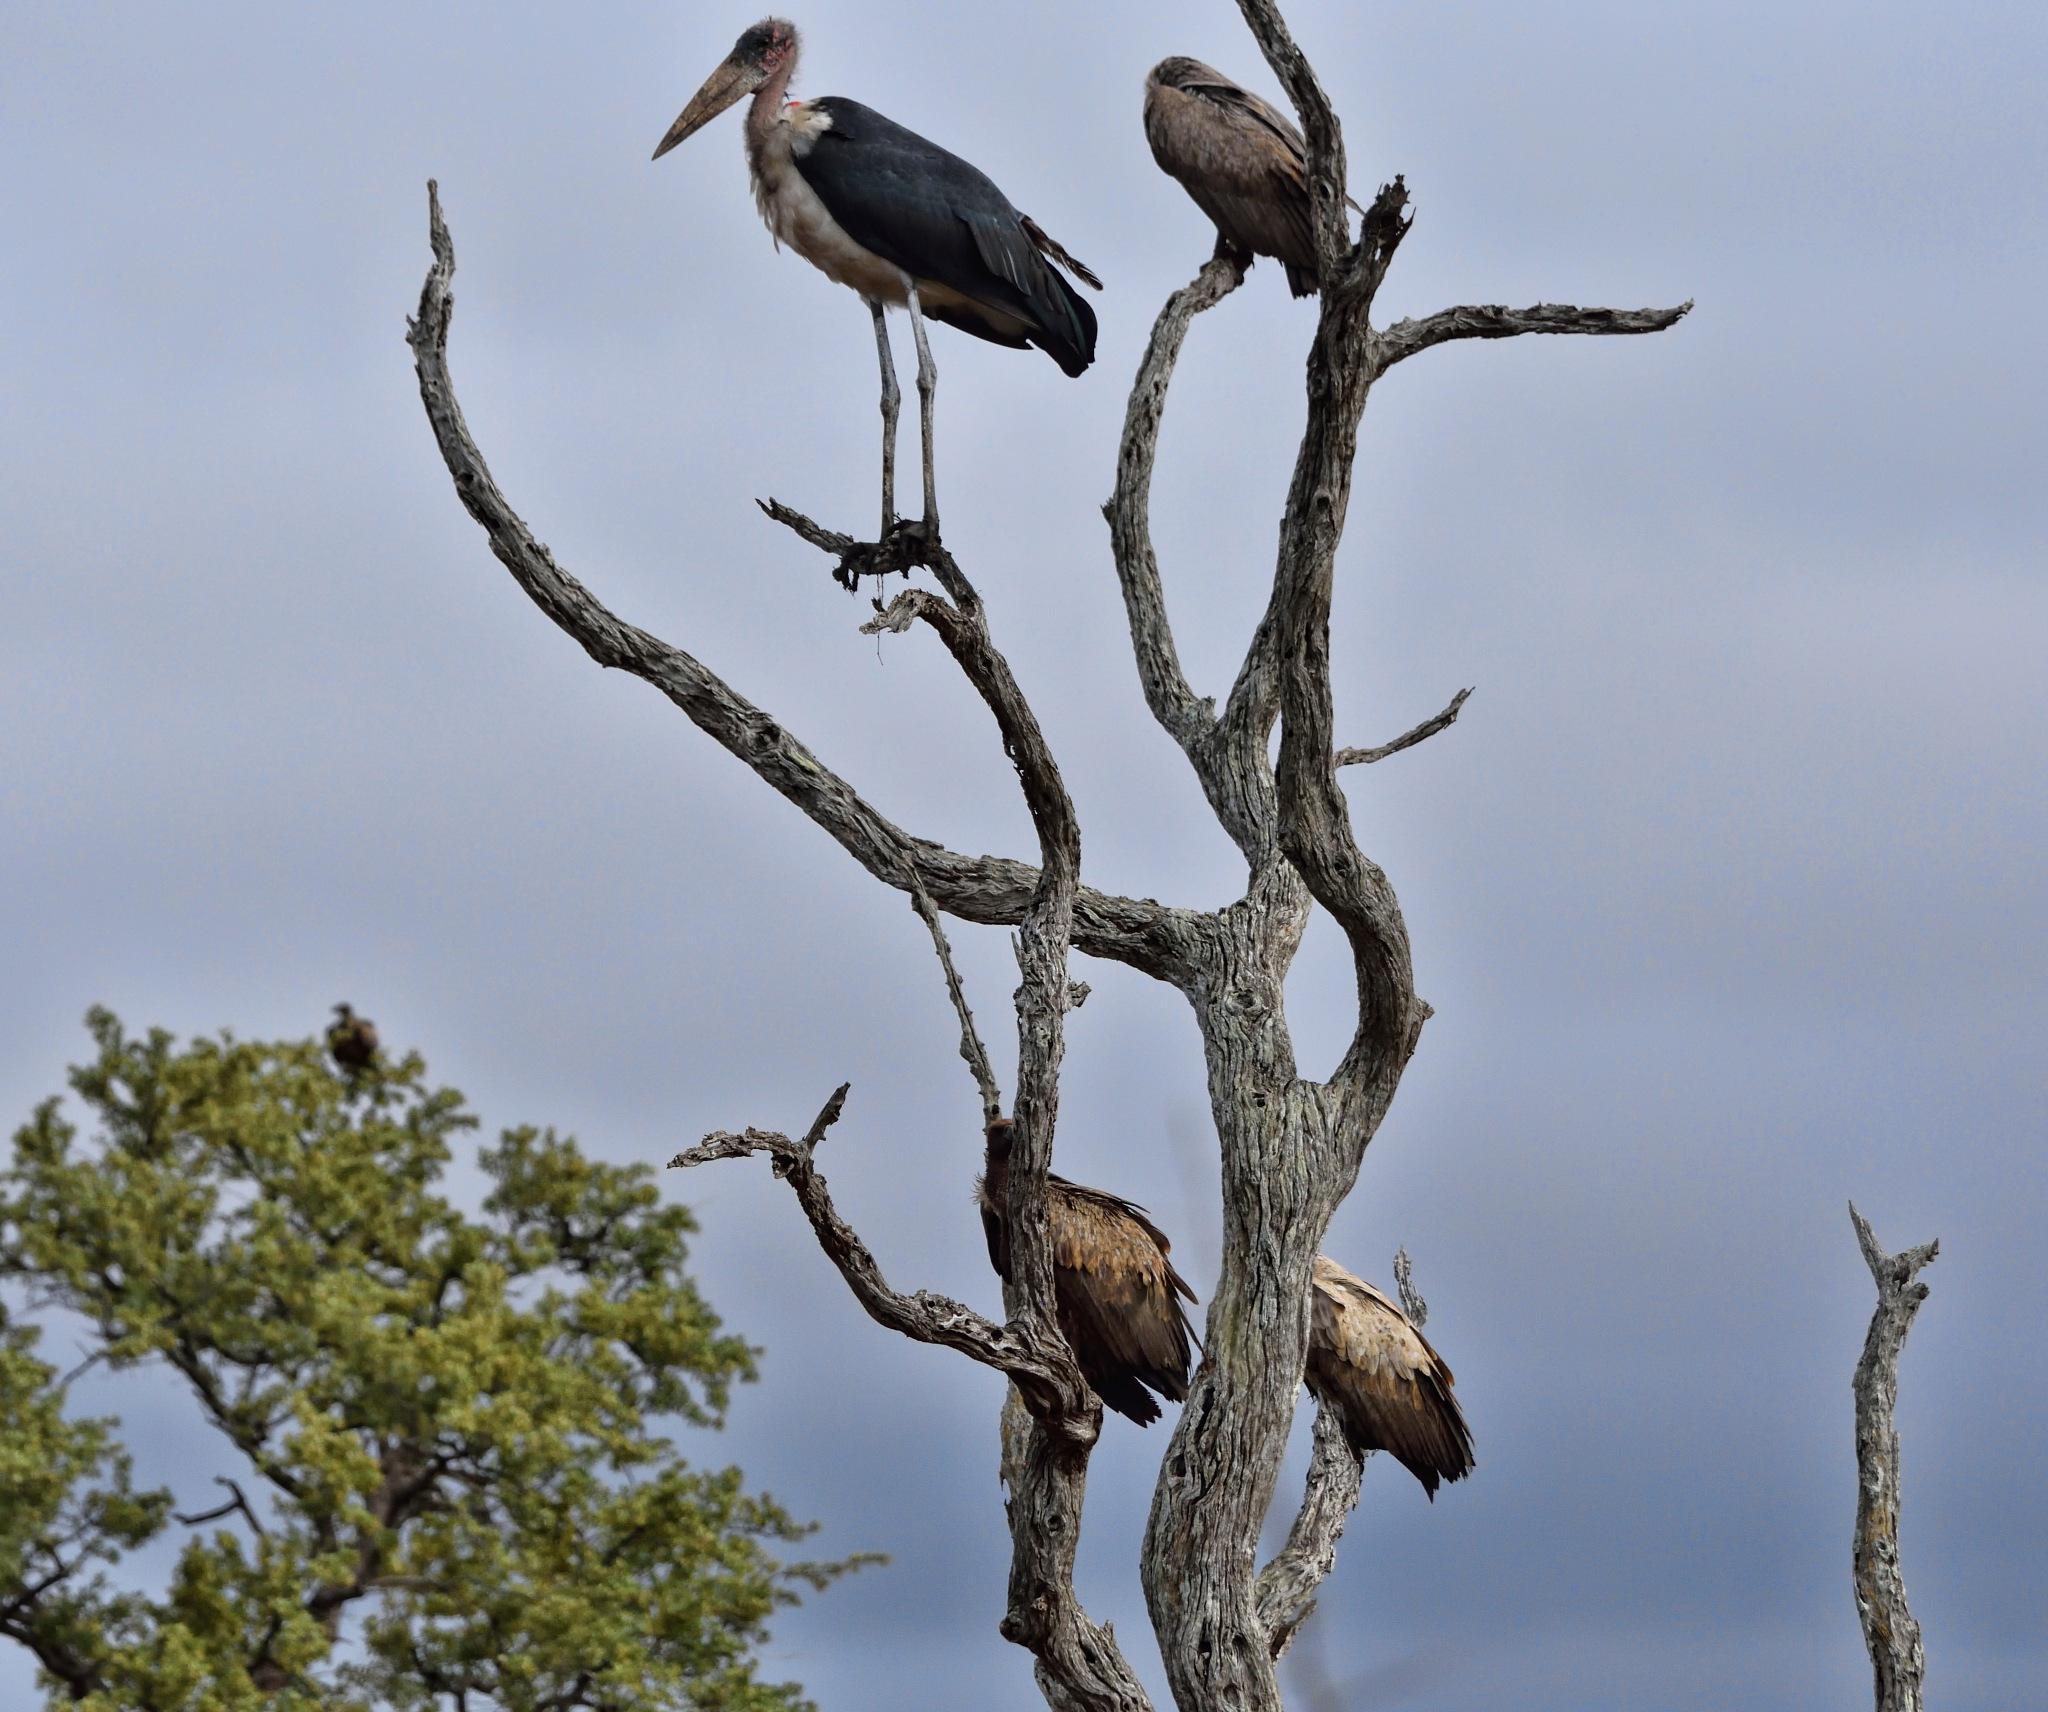 South Africa - Kruger Park (294) Marabou Stork and a White Backed Vultures by Derek Clarke